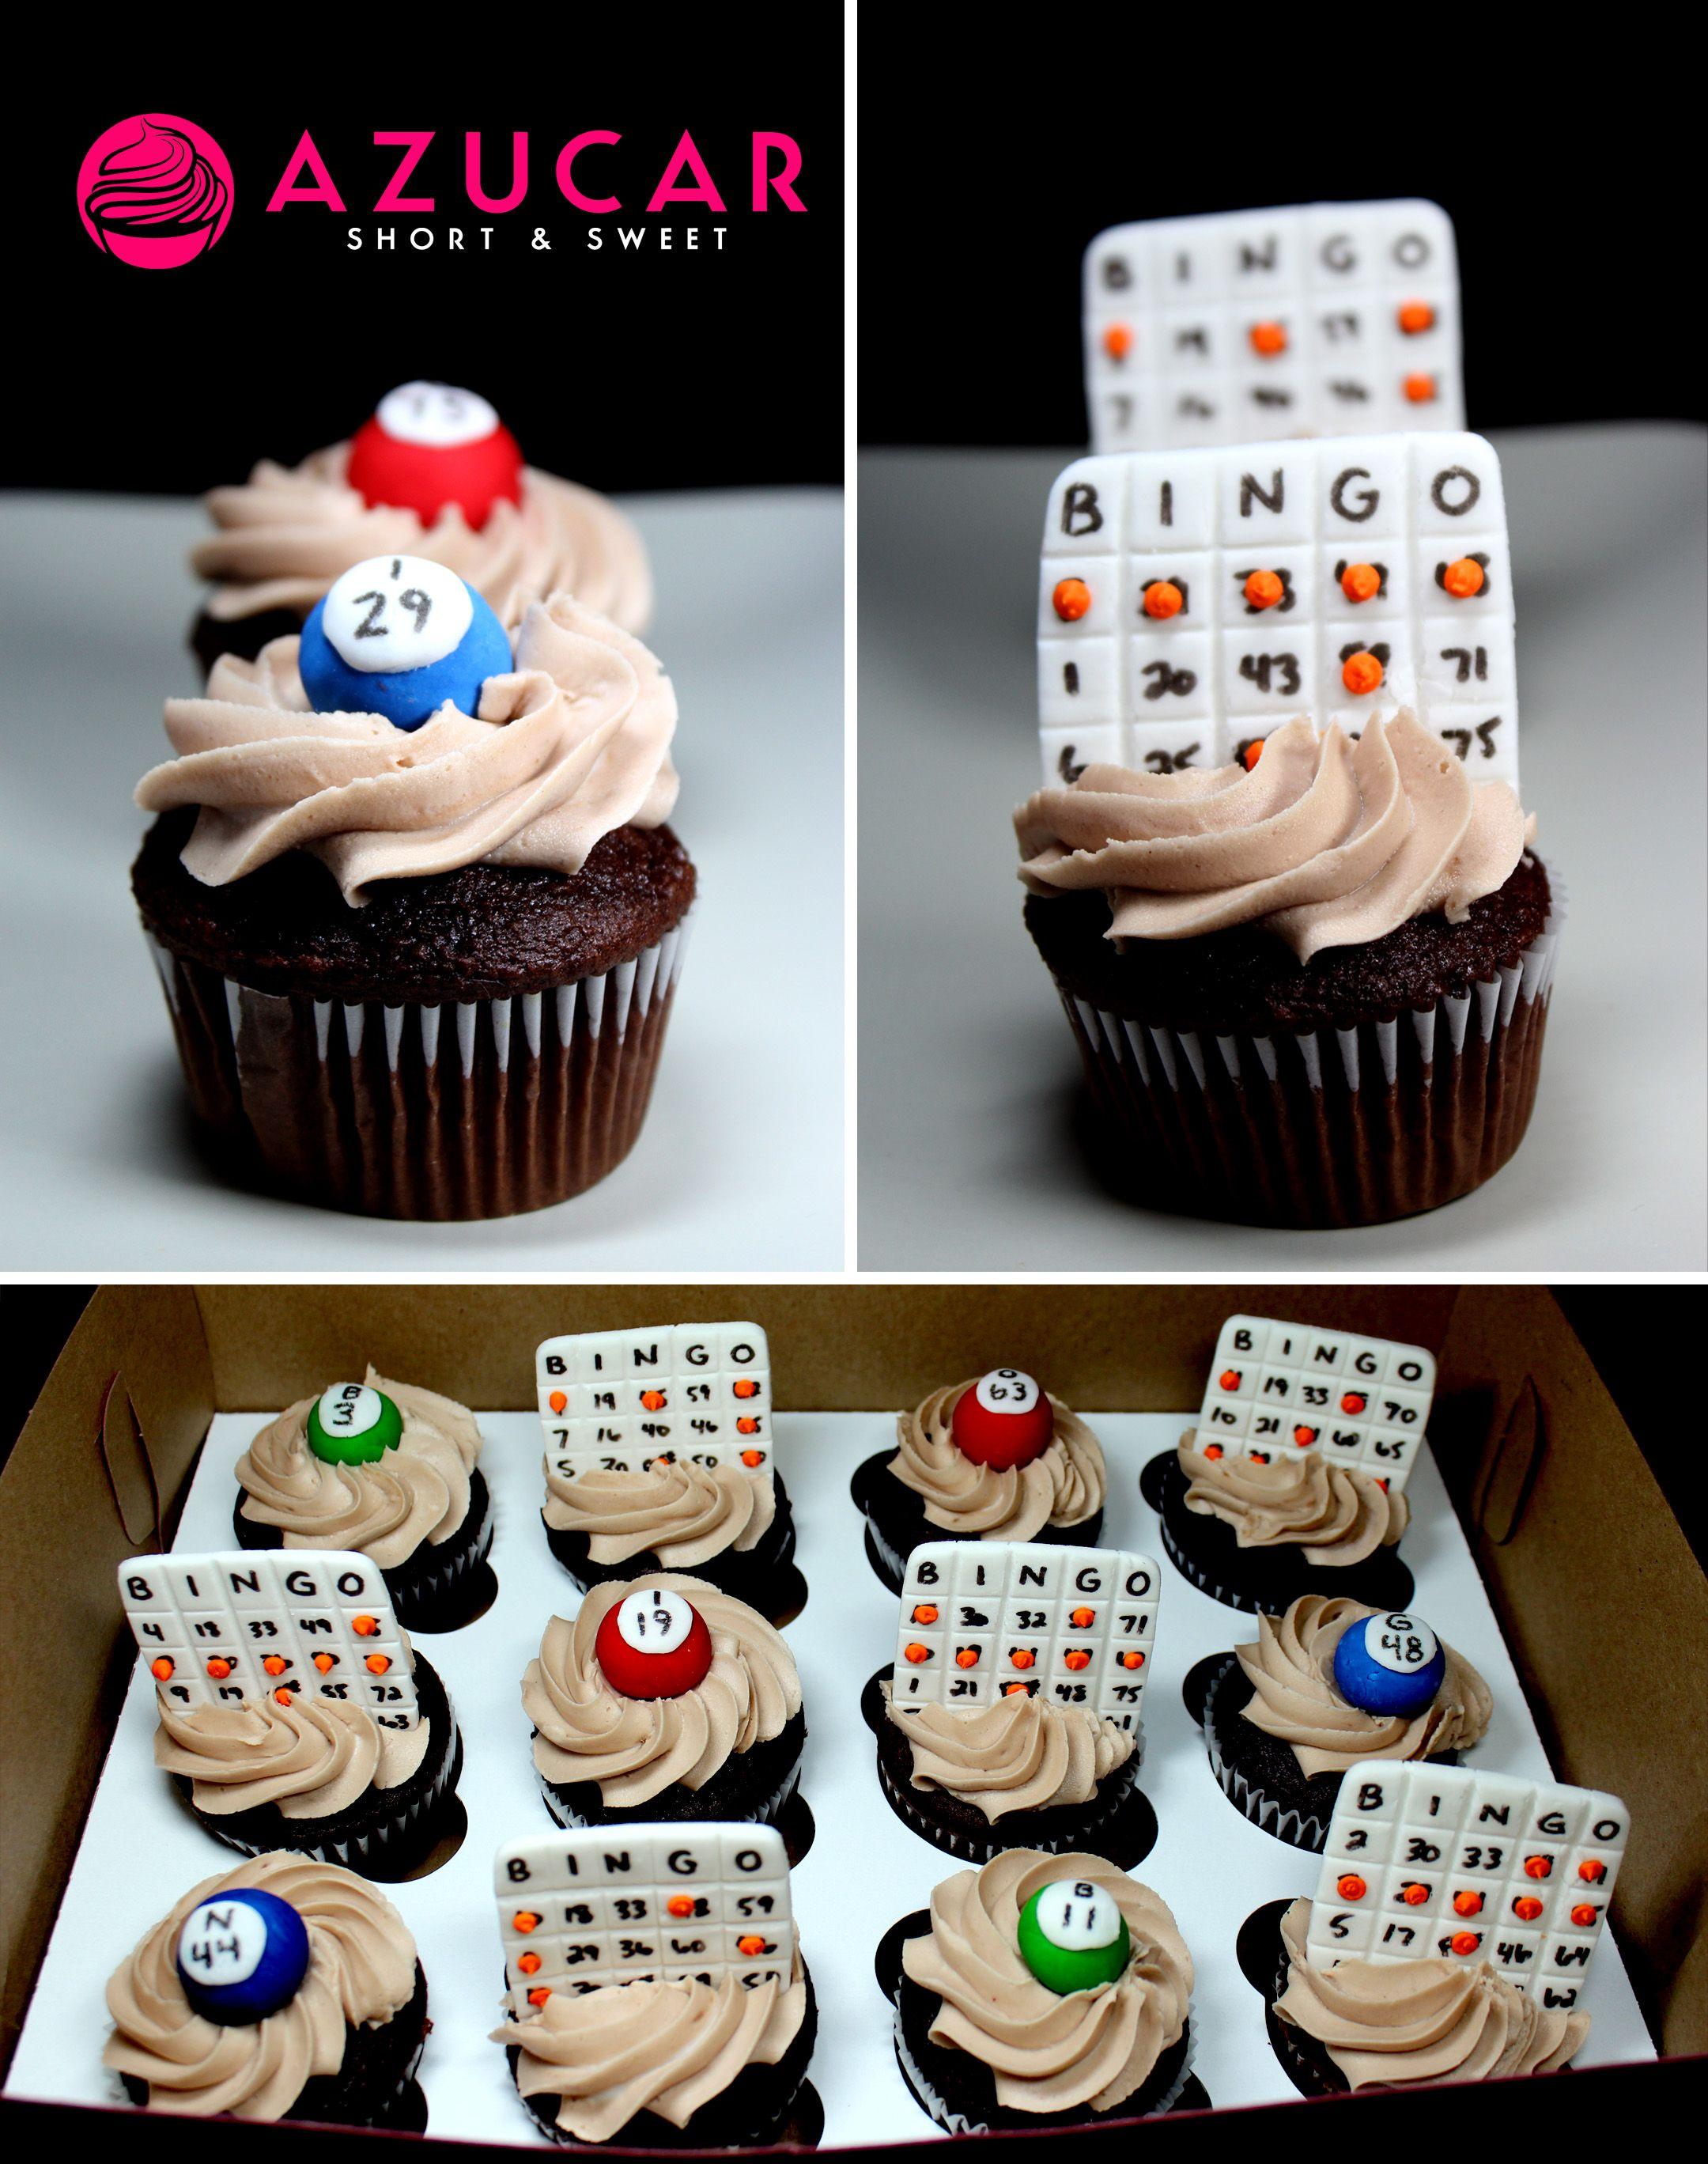 Bingo Themed Cupcakes With Images Themed Cupcakes Bingo Cake